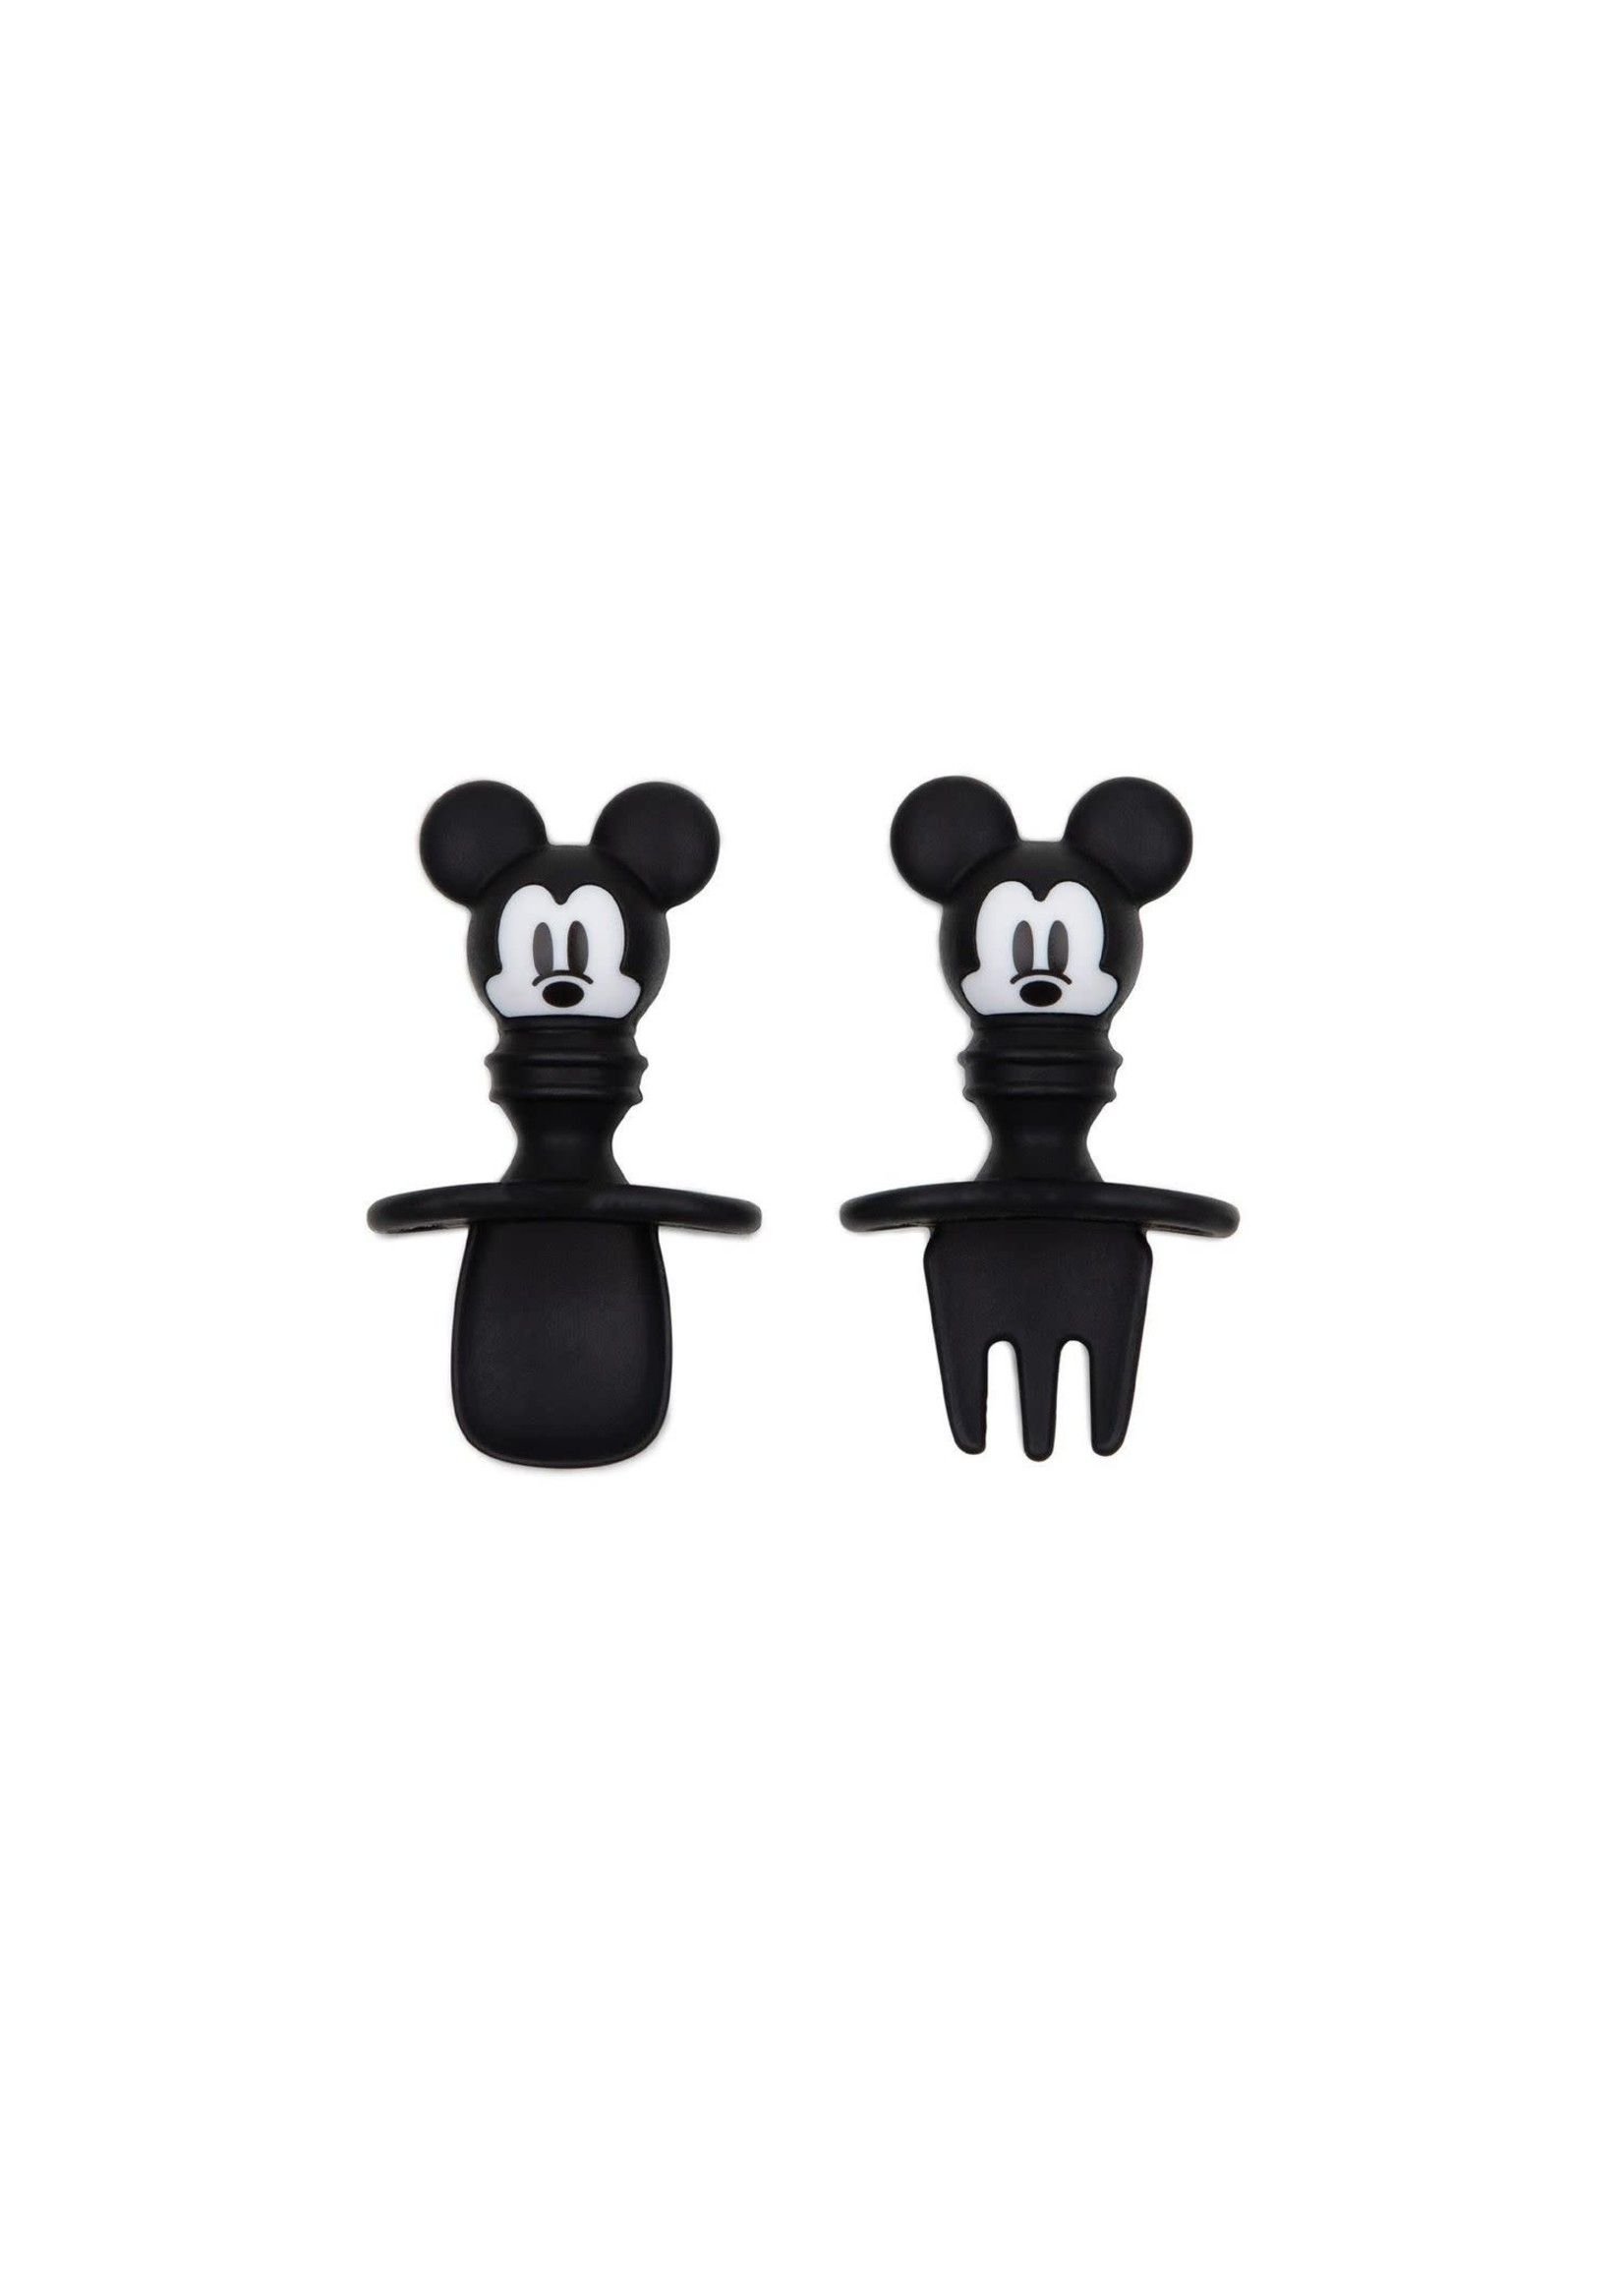 bumkins Bumkins Chewtensils (Mickey Mouse)